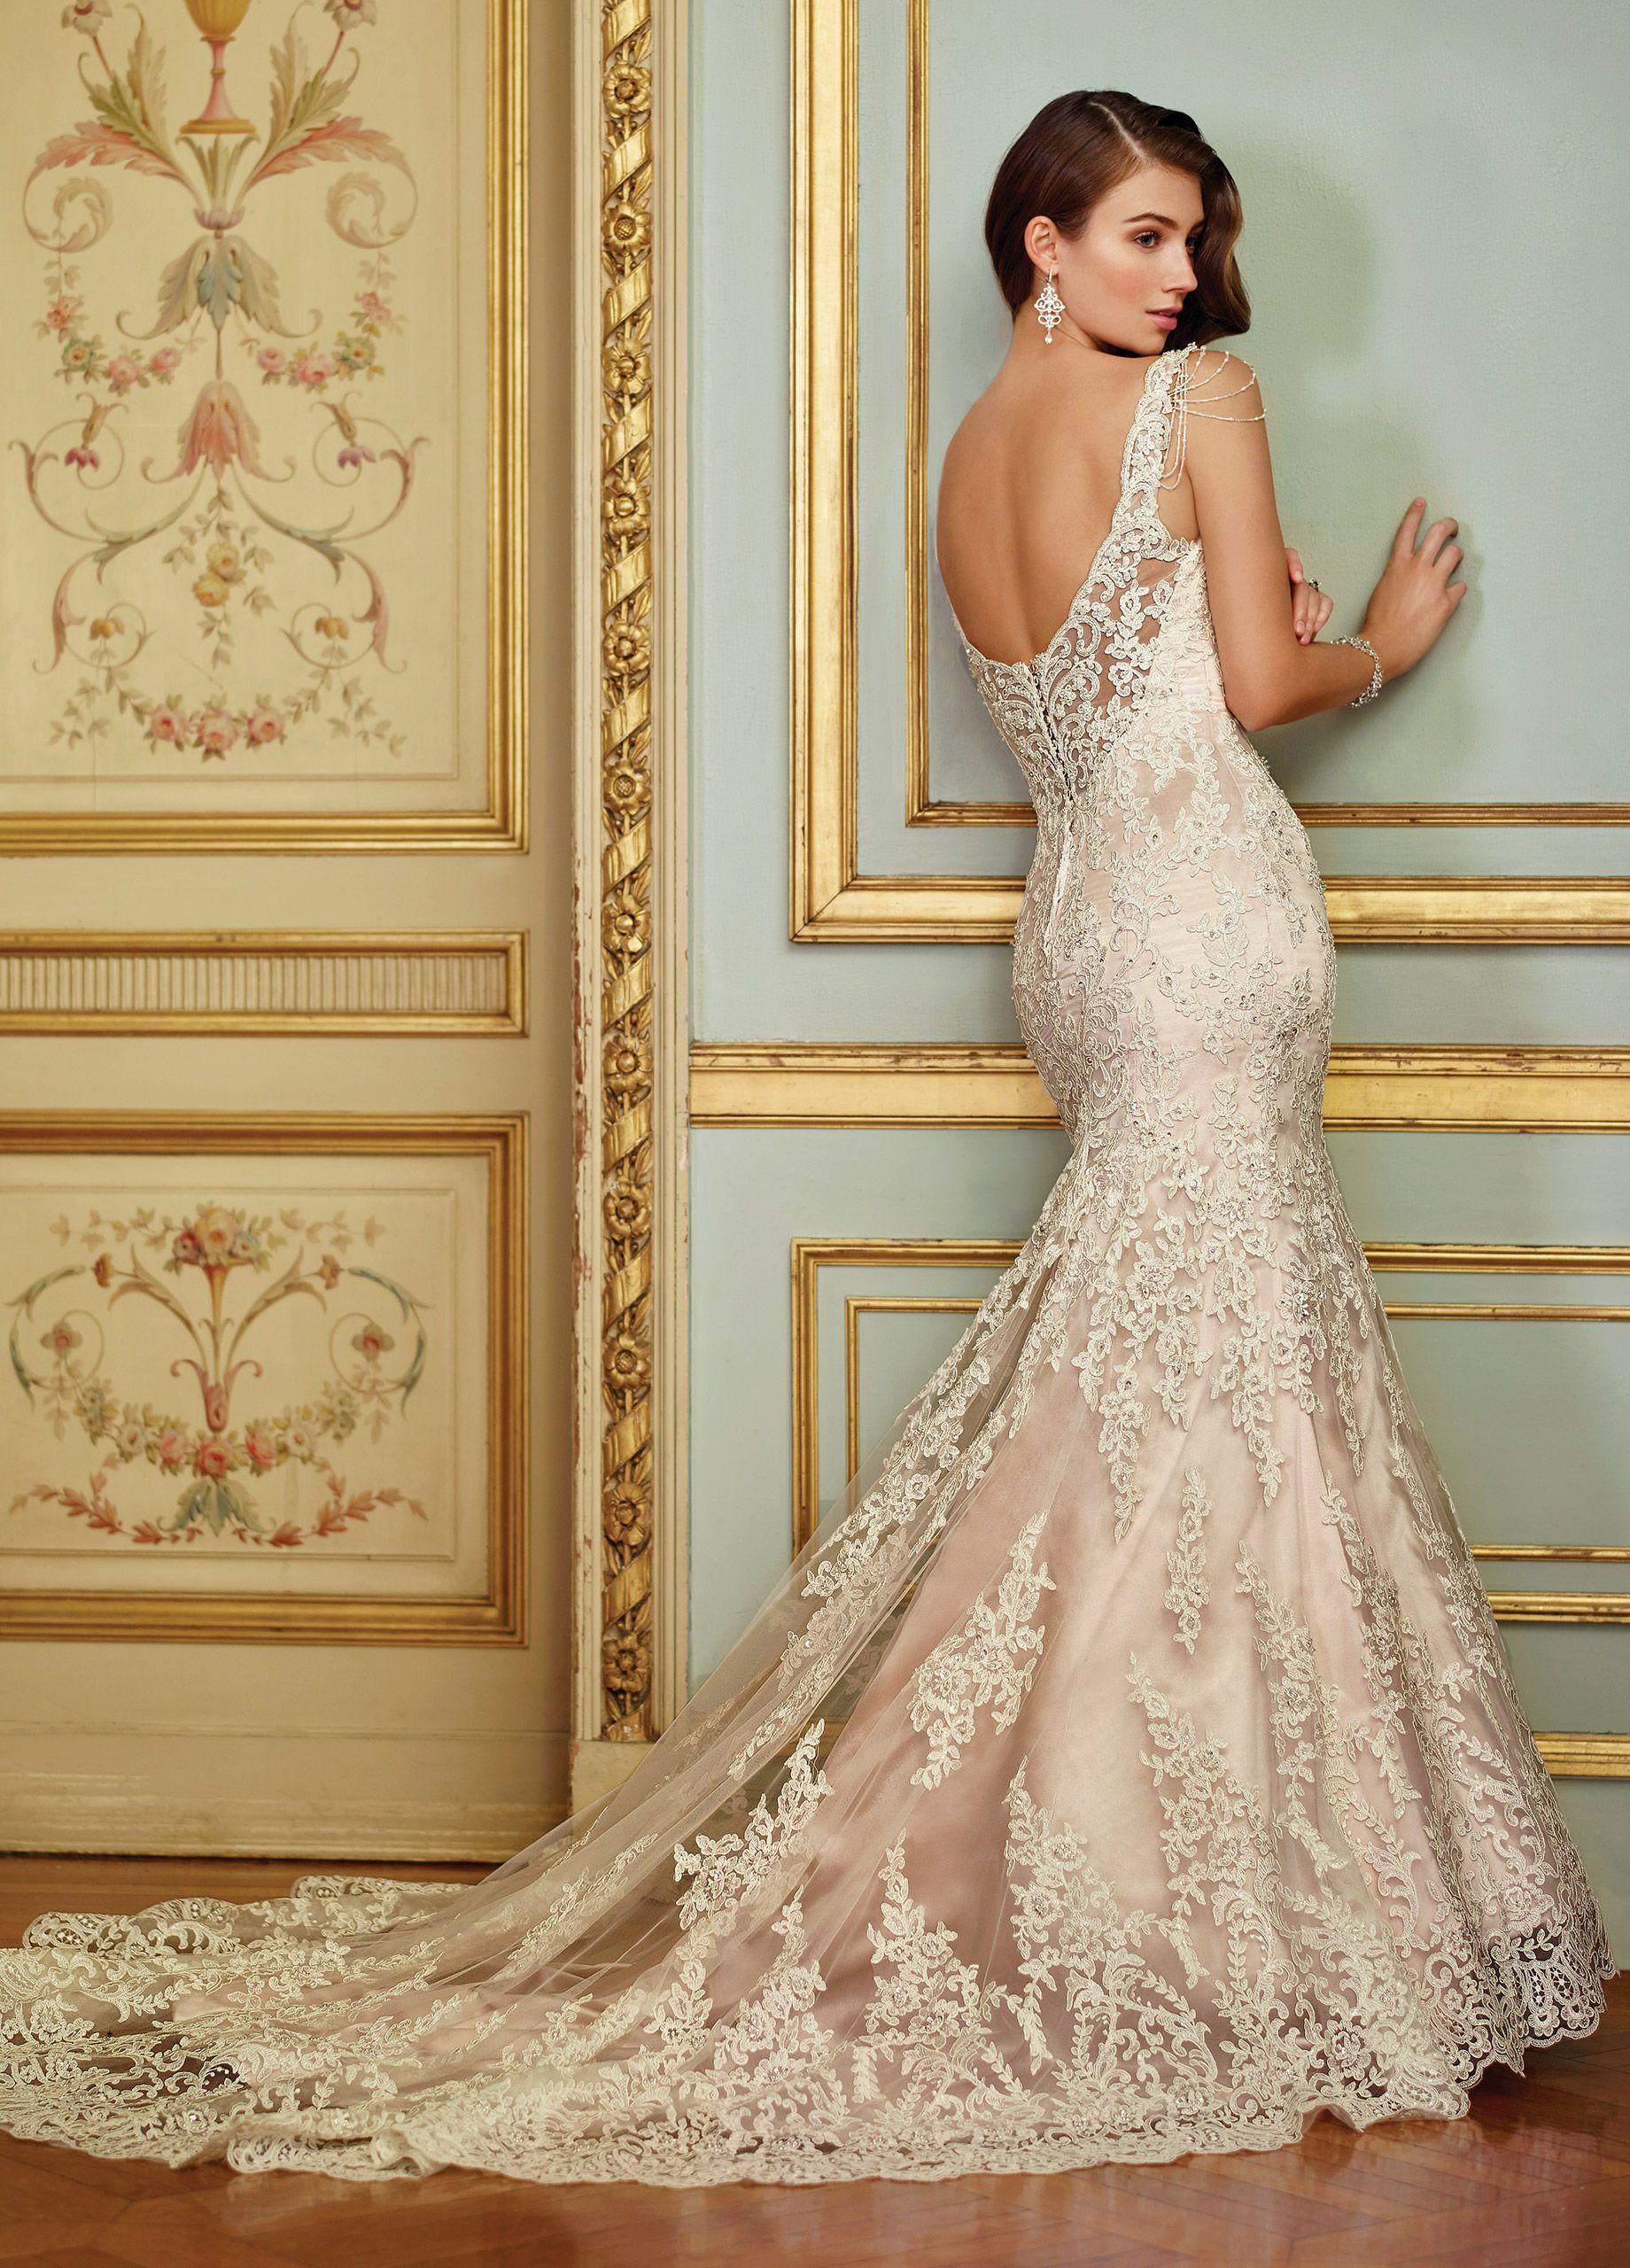 Vintage Lace & Beaded Trumpet Wedding Dress 117288 Ophira